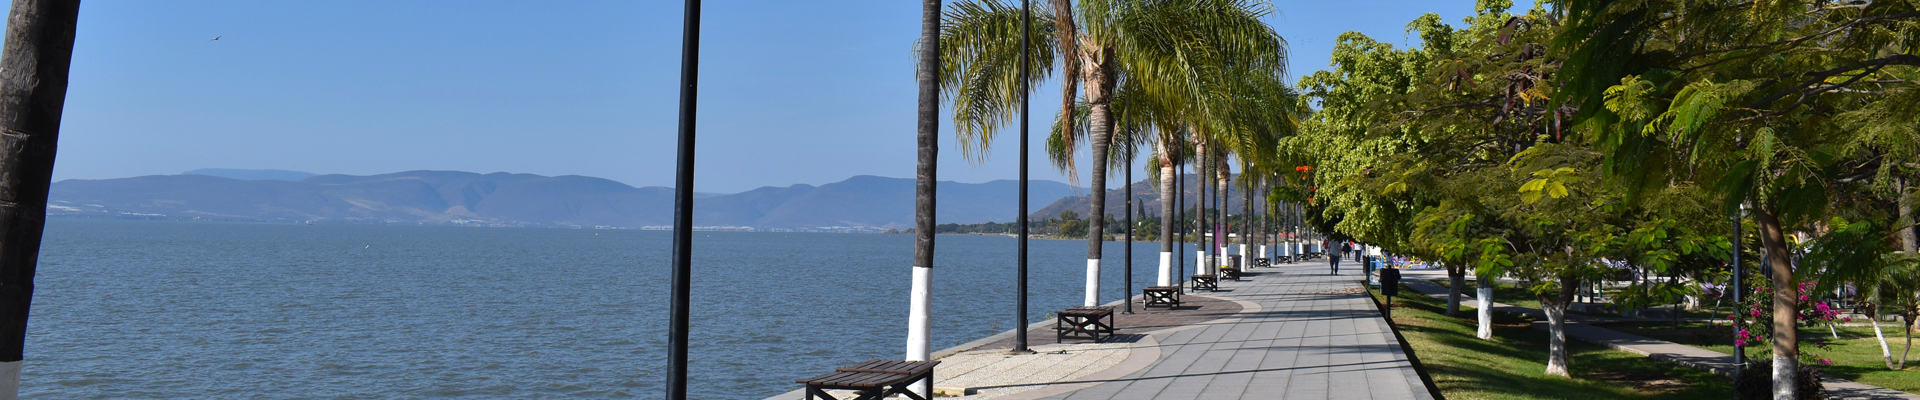 Ajijic Boardwalk, Lake Chapala